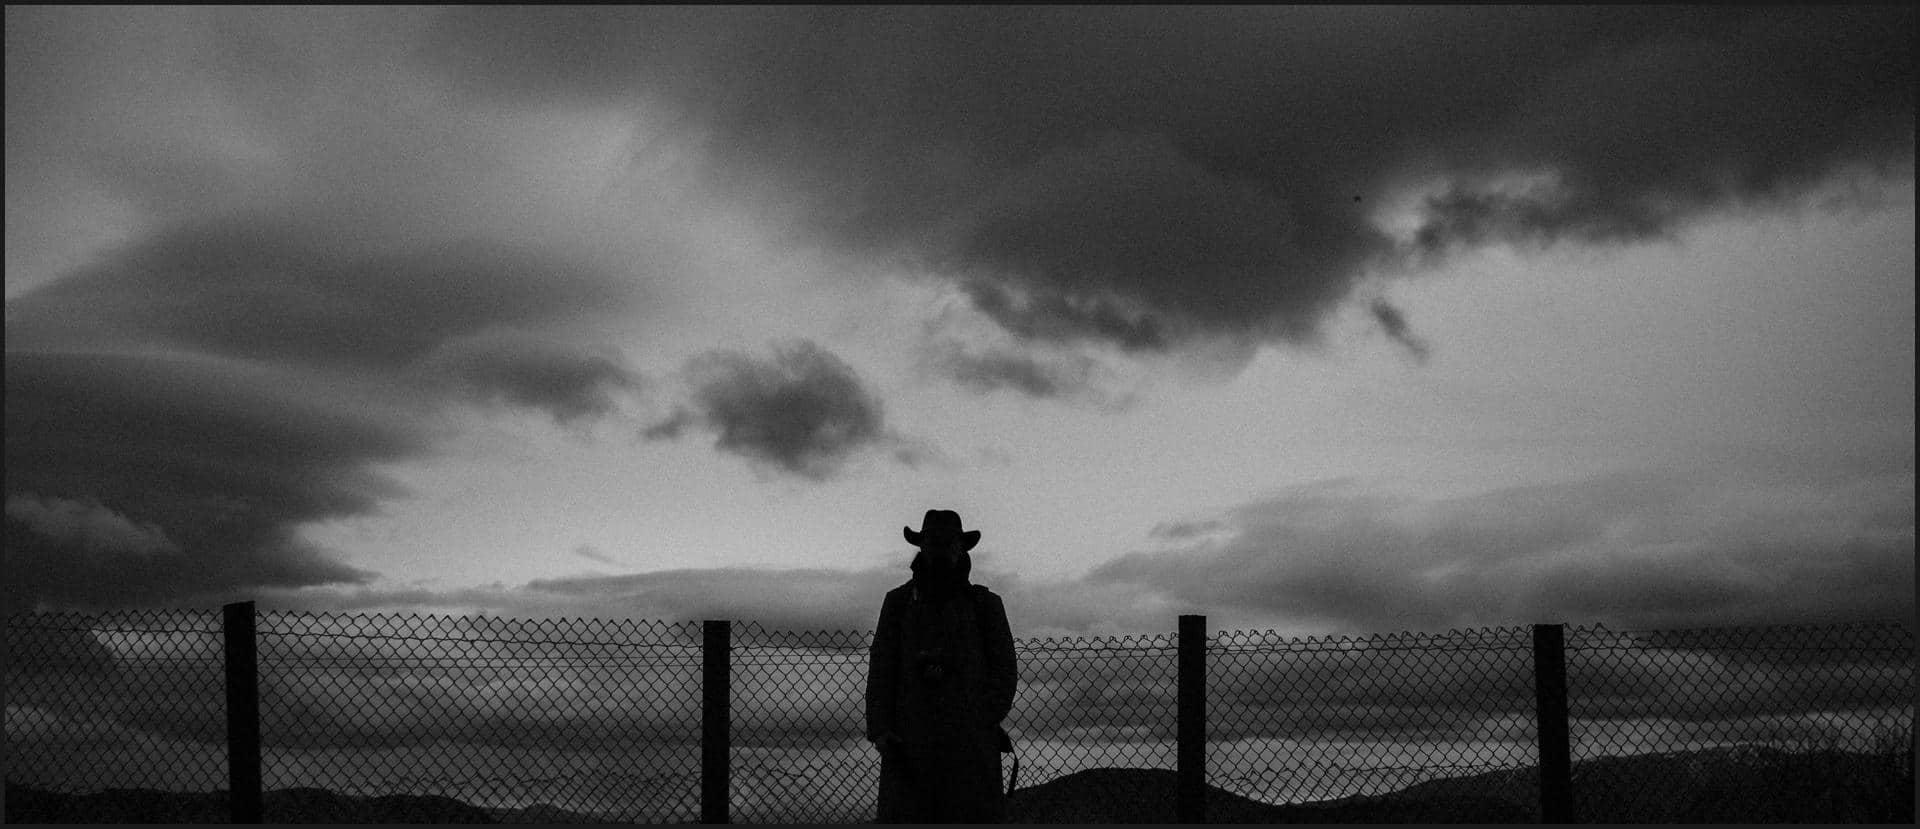 california, road trip, black and white, cowboy